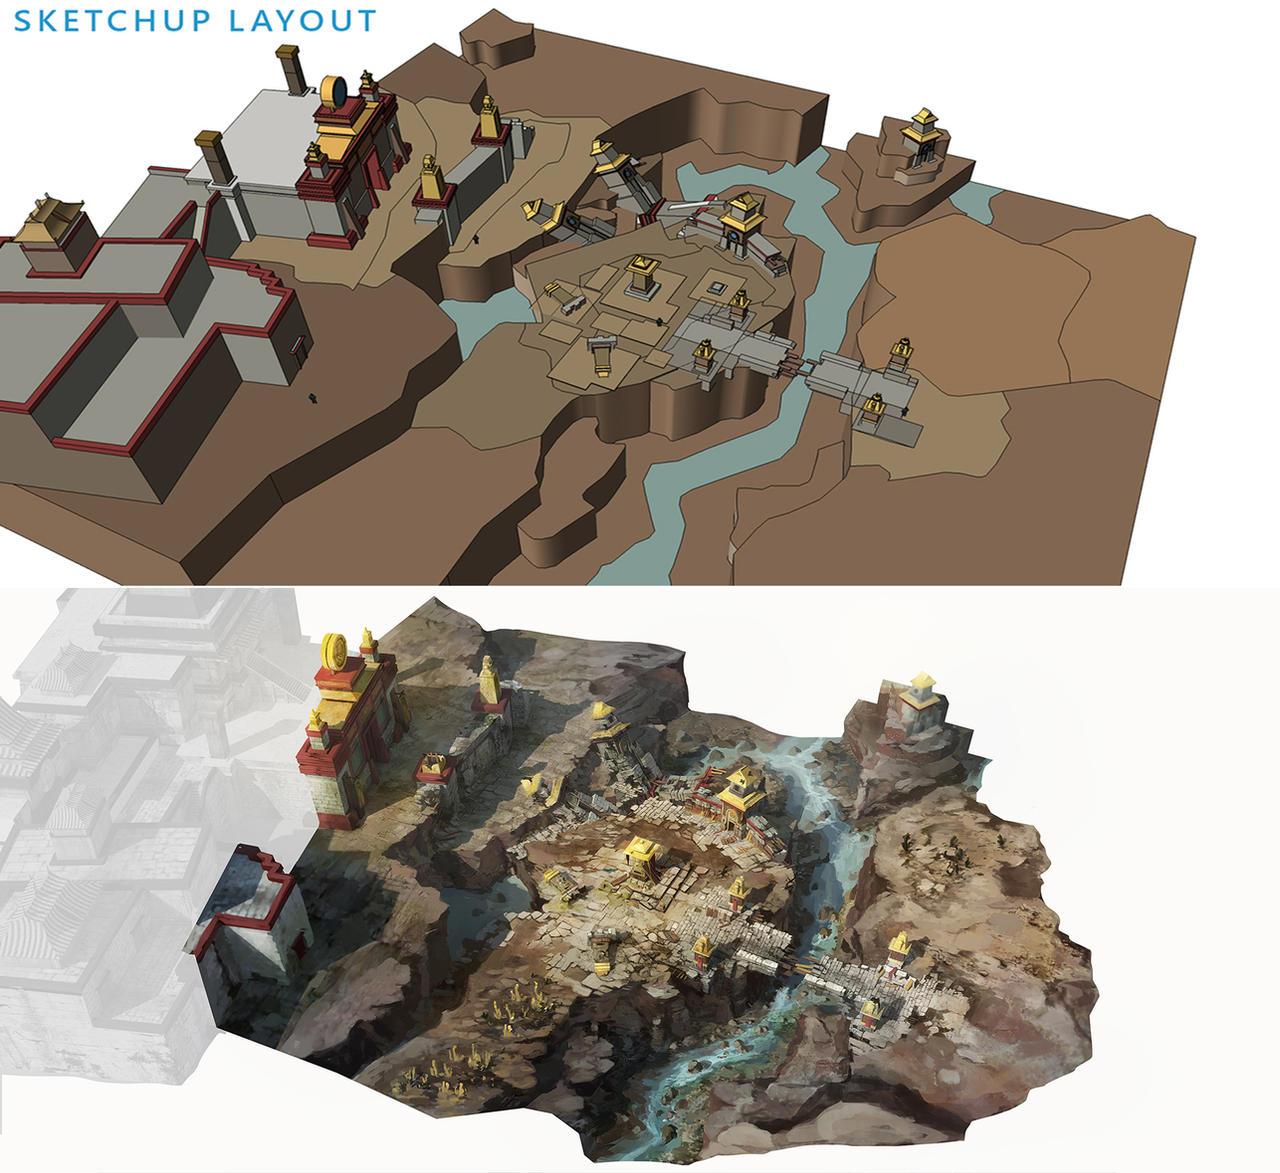 game level design with sketchup by franklinchan on deviantart